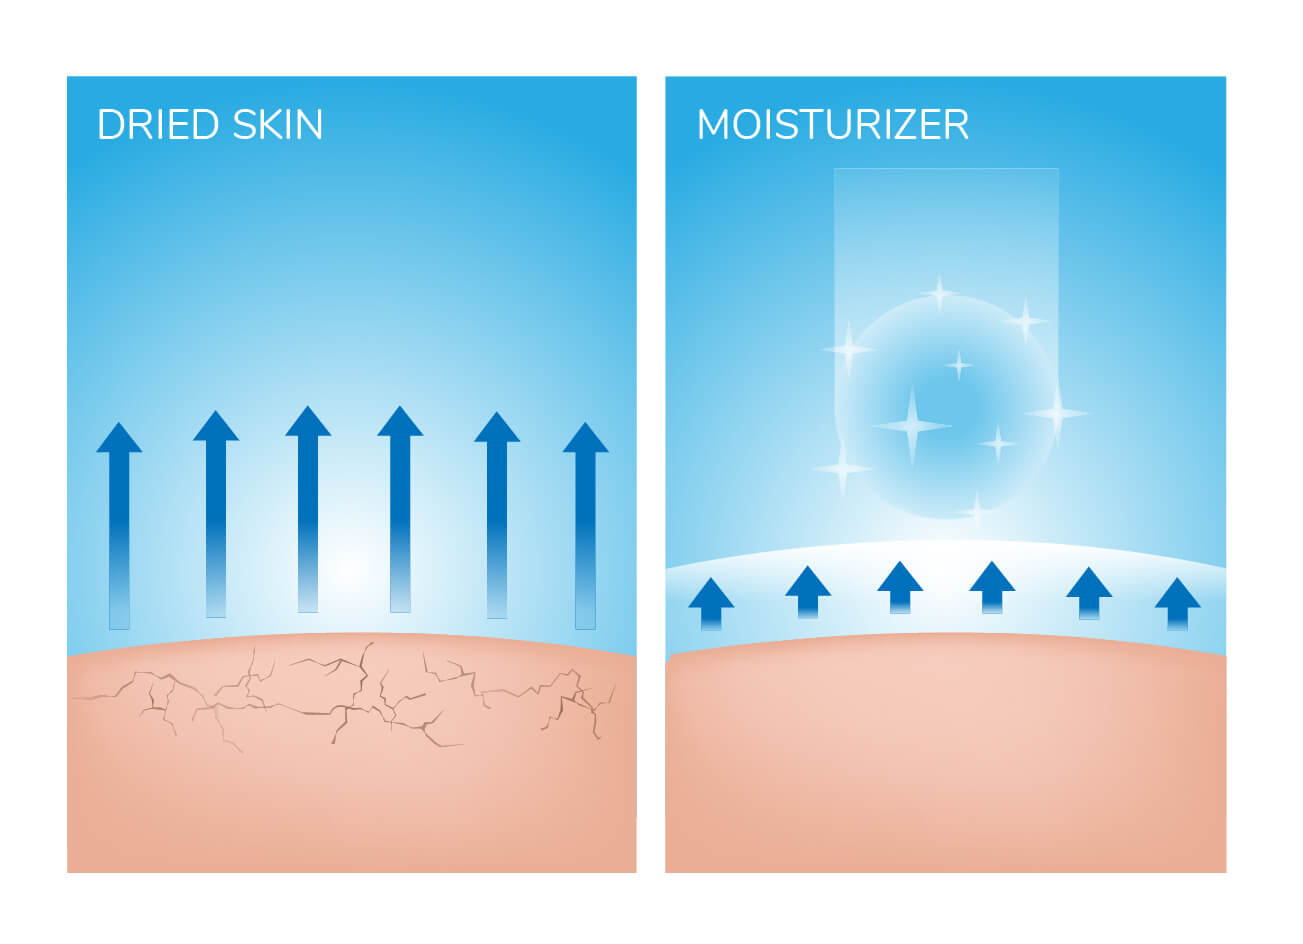 Illustration of dry versus moisturized skin